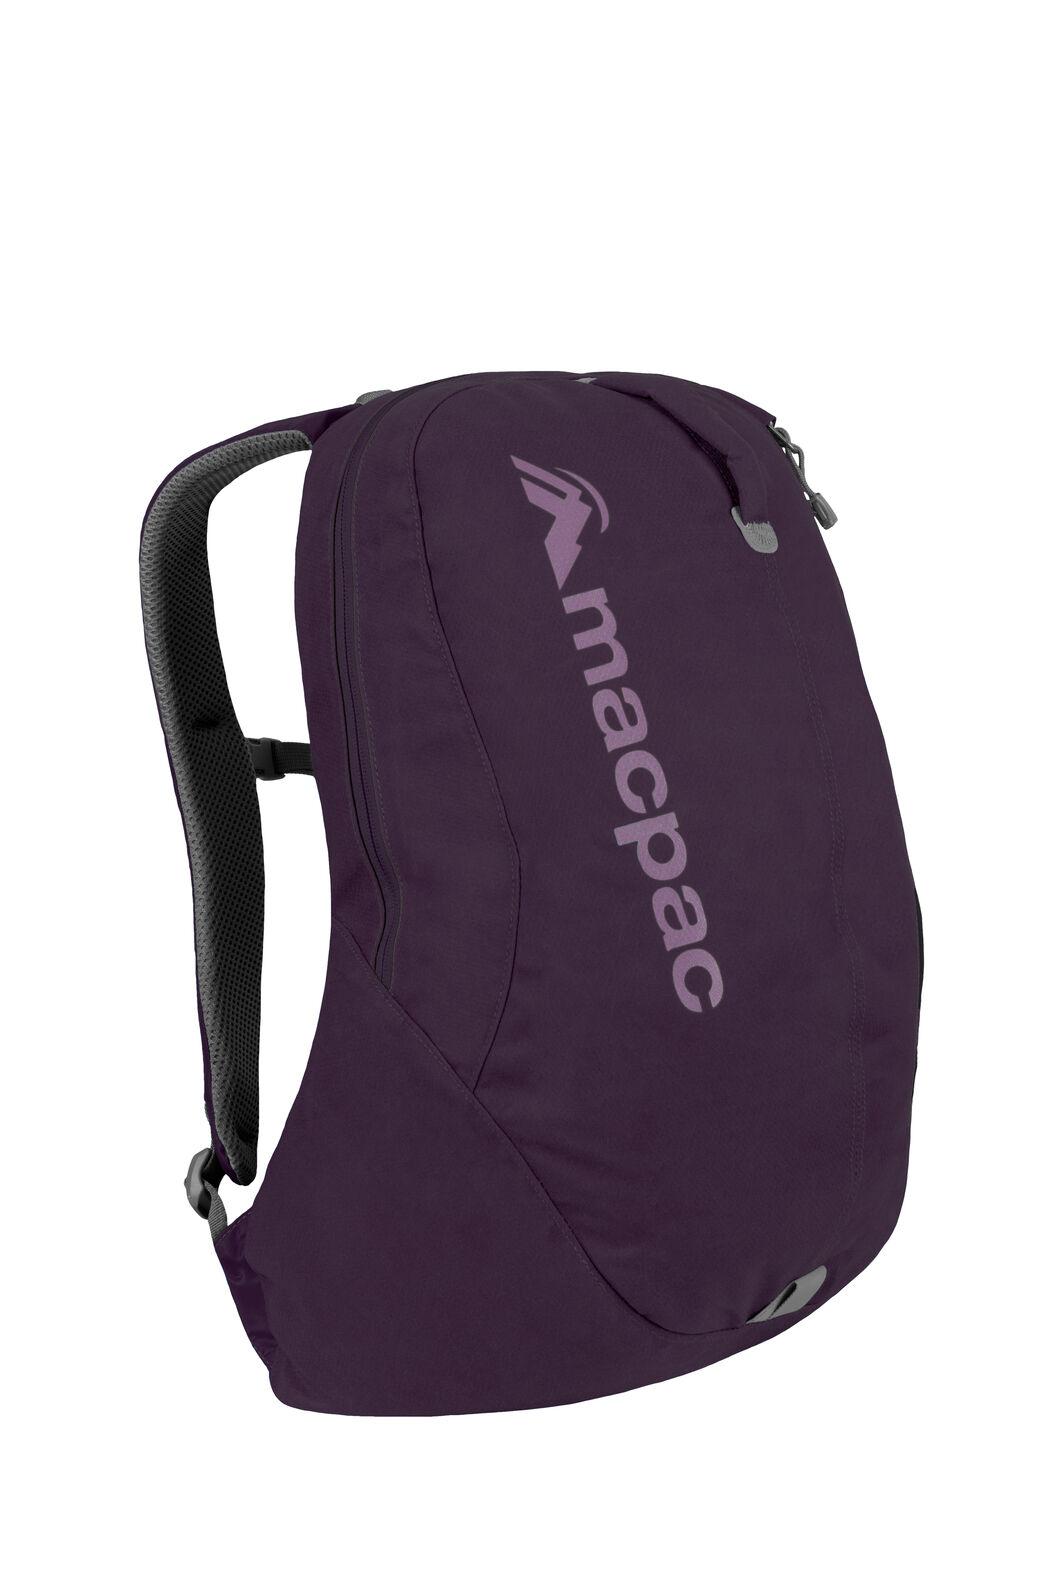 Macpac Kahu AzTec® 22L Backpack, Potent Purple, hi-res